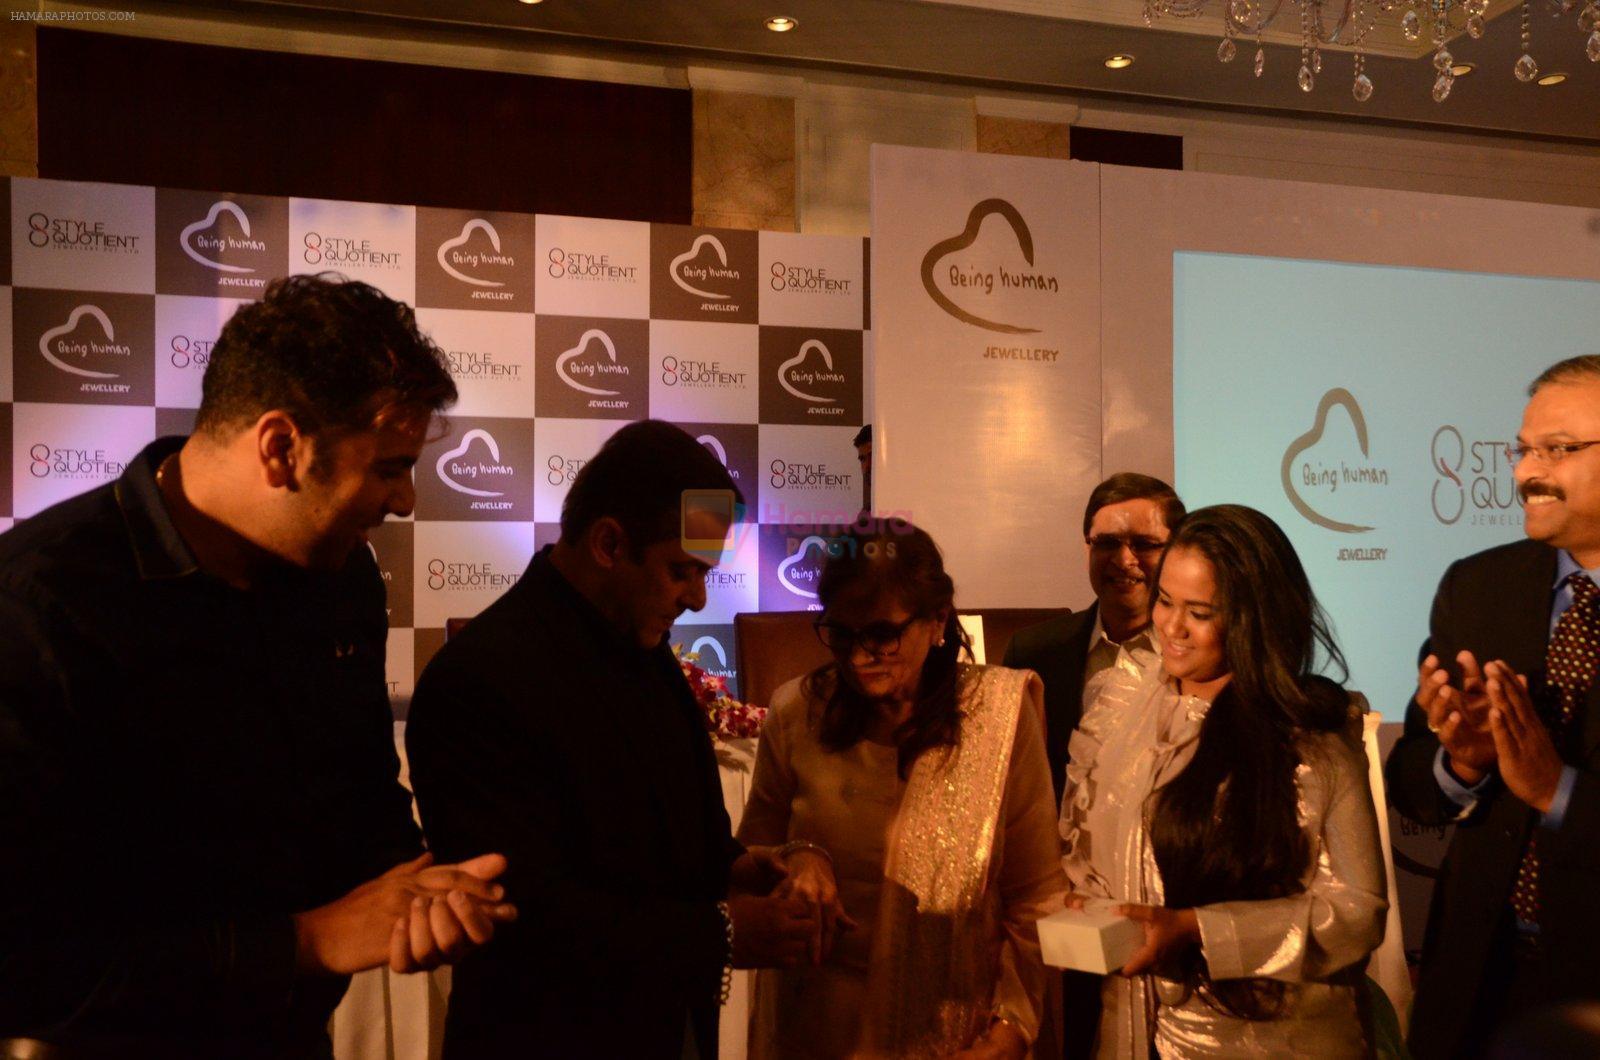 Salman Khan, Arpita Khan at Being Human jewellery launch on 30th Sept 2016